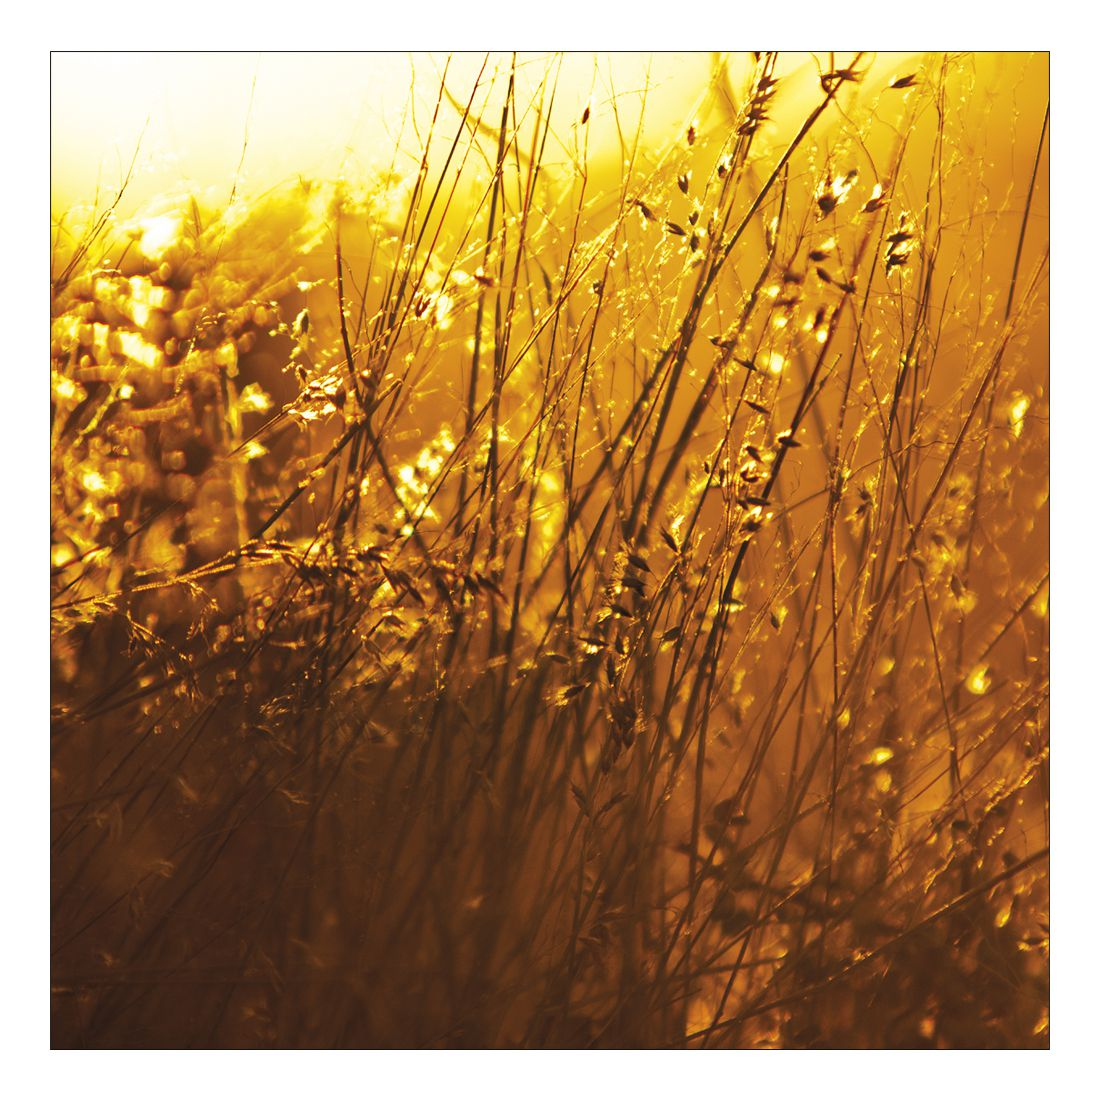 Leinwandbild YELLOW SUNRISE IN THE FIELDS – Abmessung 100 x 75 cm, Gallery of Innovative Art jetzt kaufen